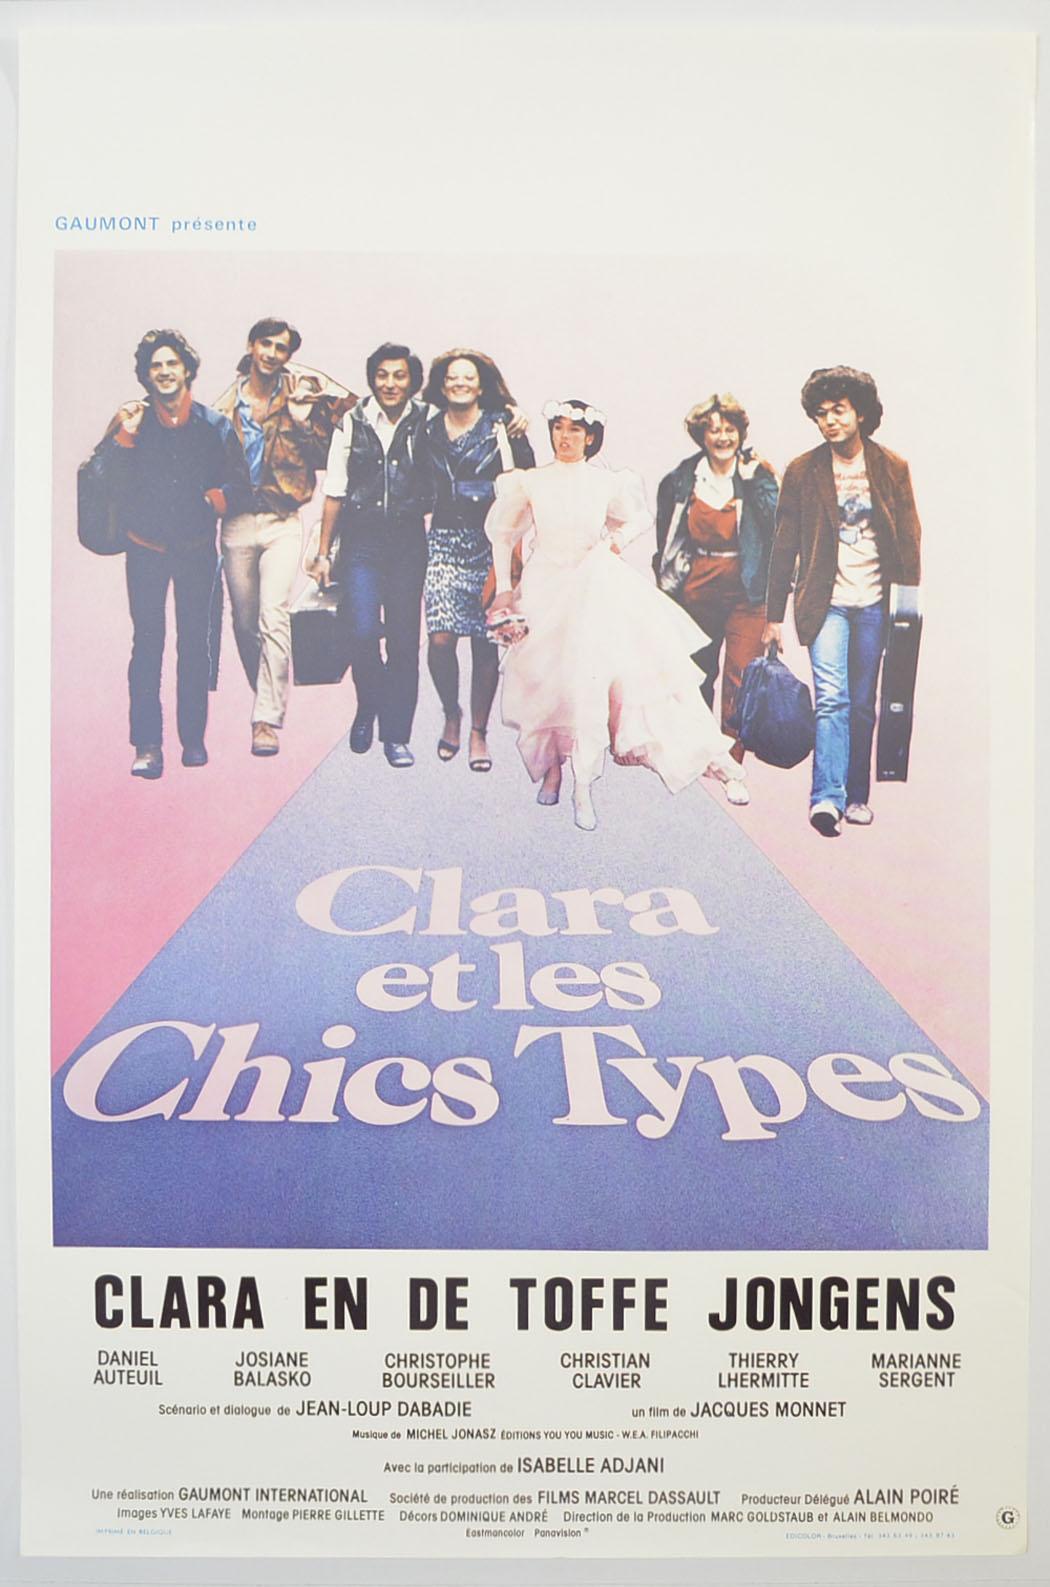 Clara Et Les Chics Types : clara, chics, types, Clara, Chics, Types, <p><i>, (Original, Belgian, Movie, Poster), </i></p>, Original, Cinema, Poster, Pastposters.com, British, Posters, 1-Sheet